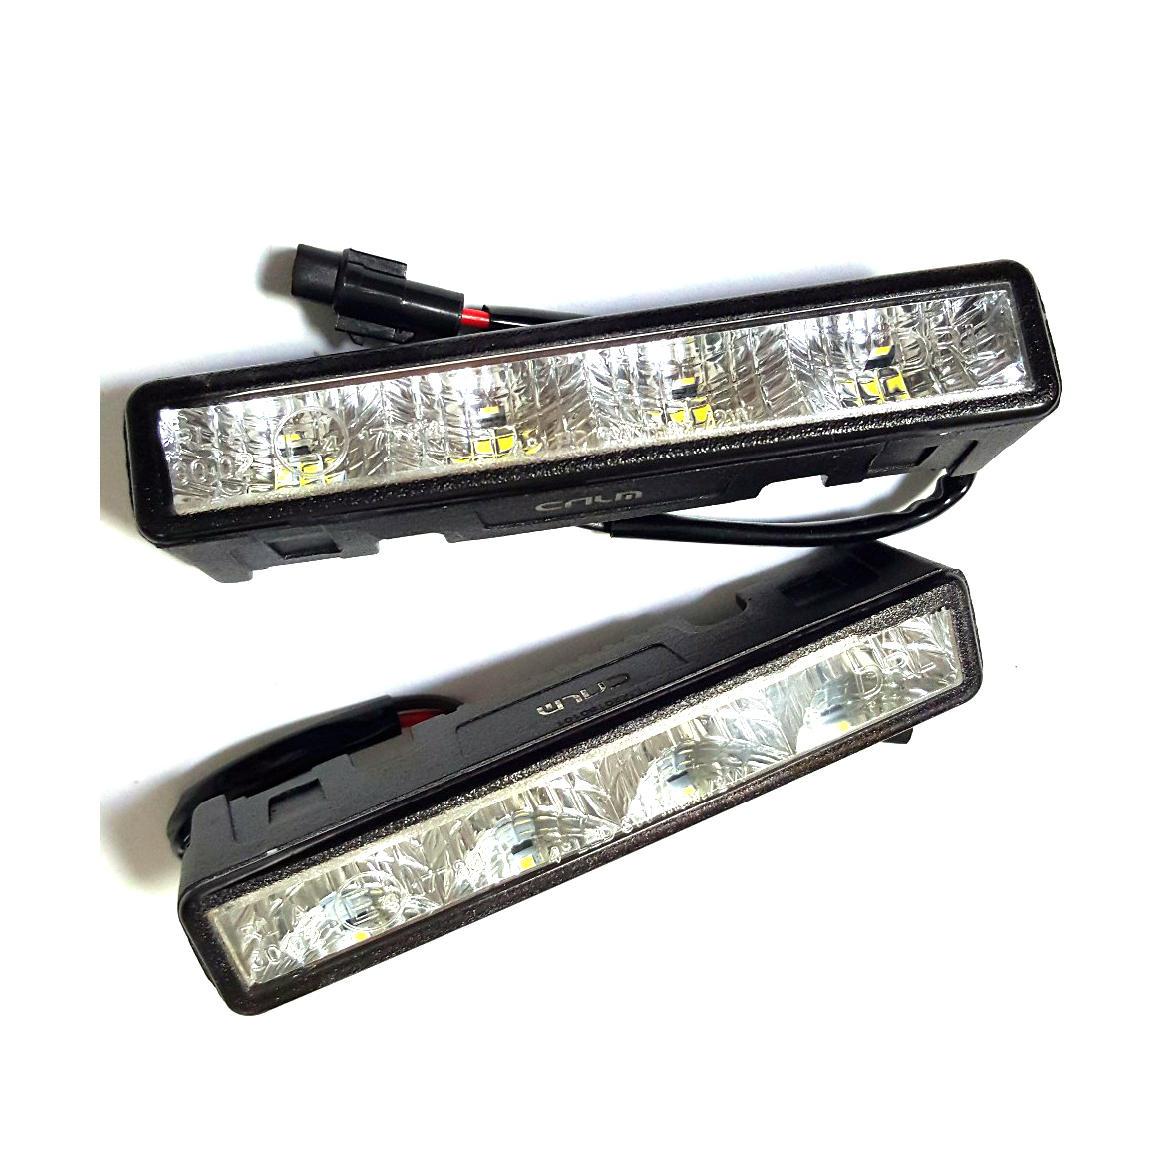 Car daytime running lights PR68